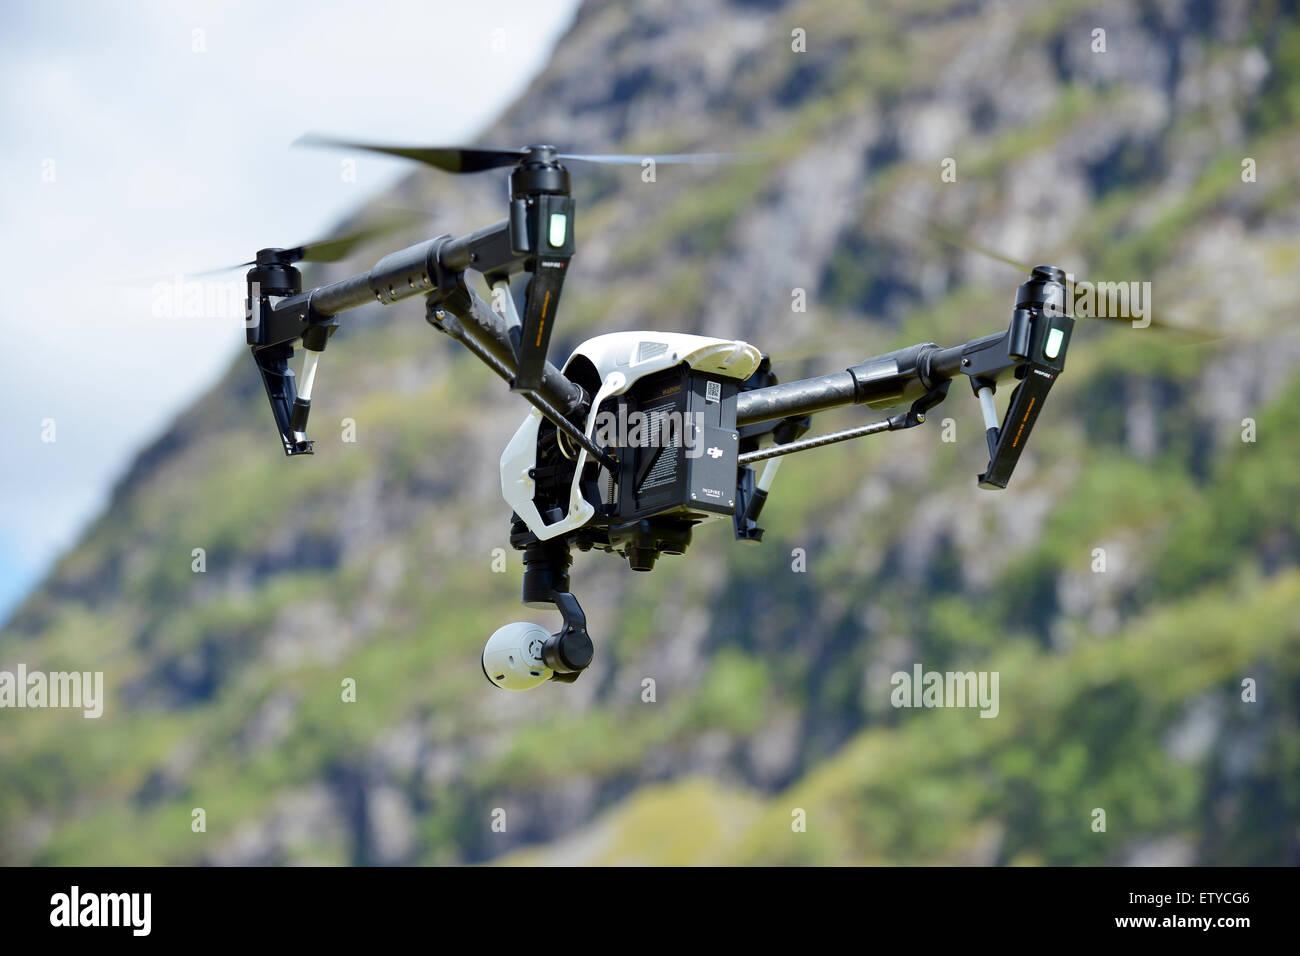 Drohne mit Kamera fliegen Stockbild